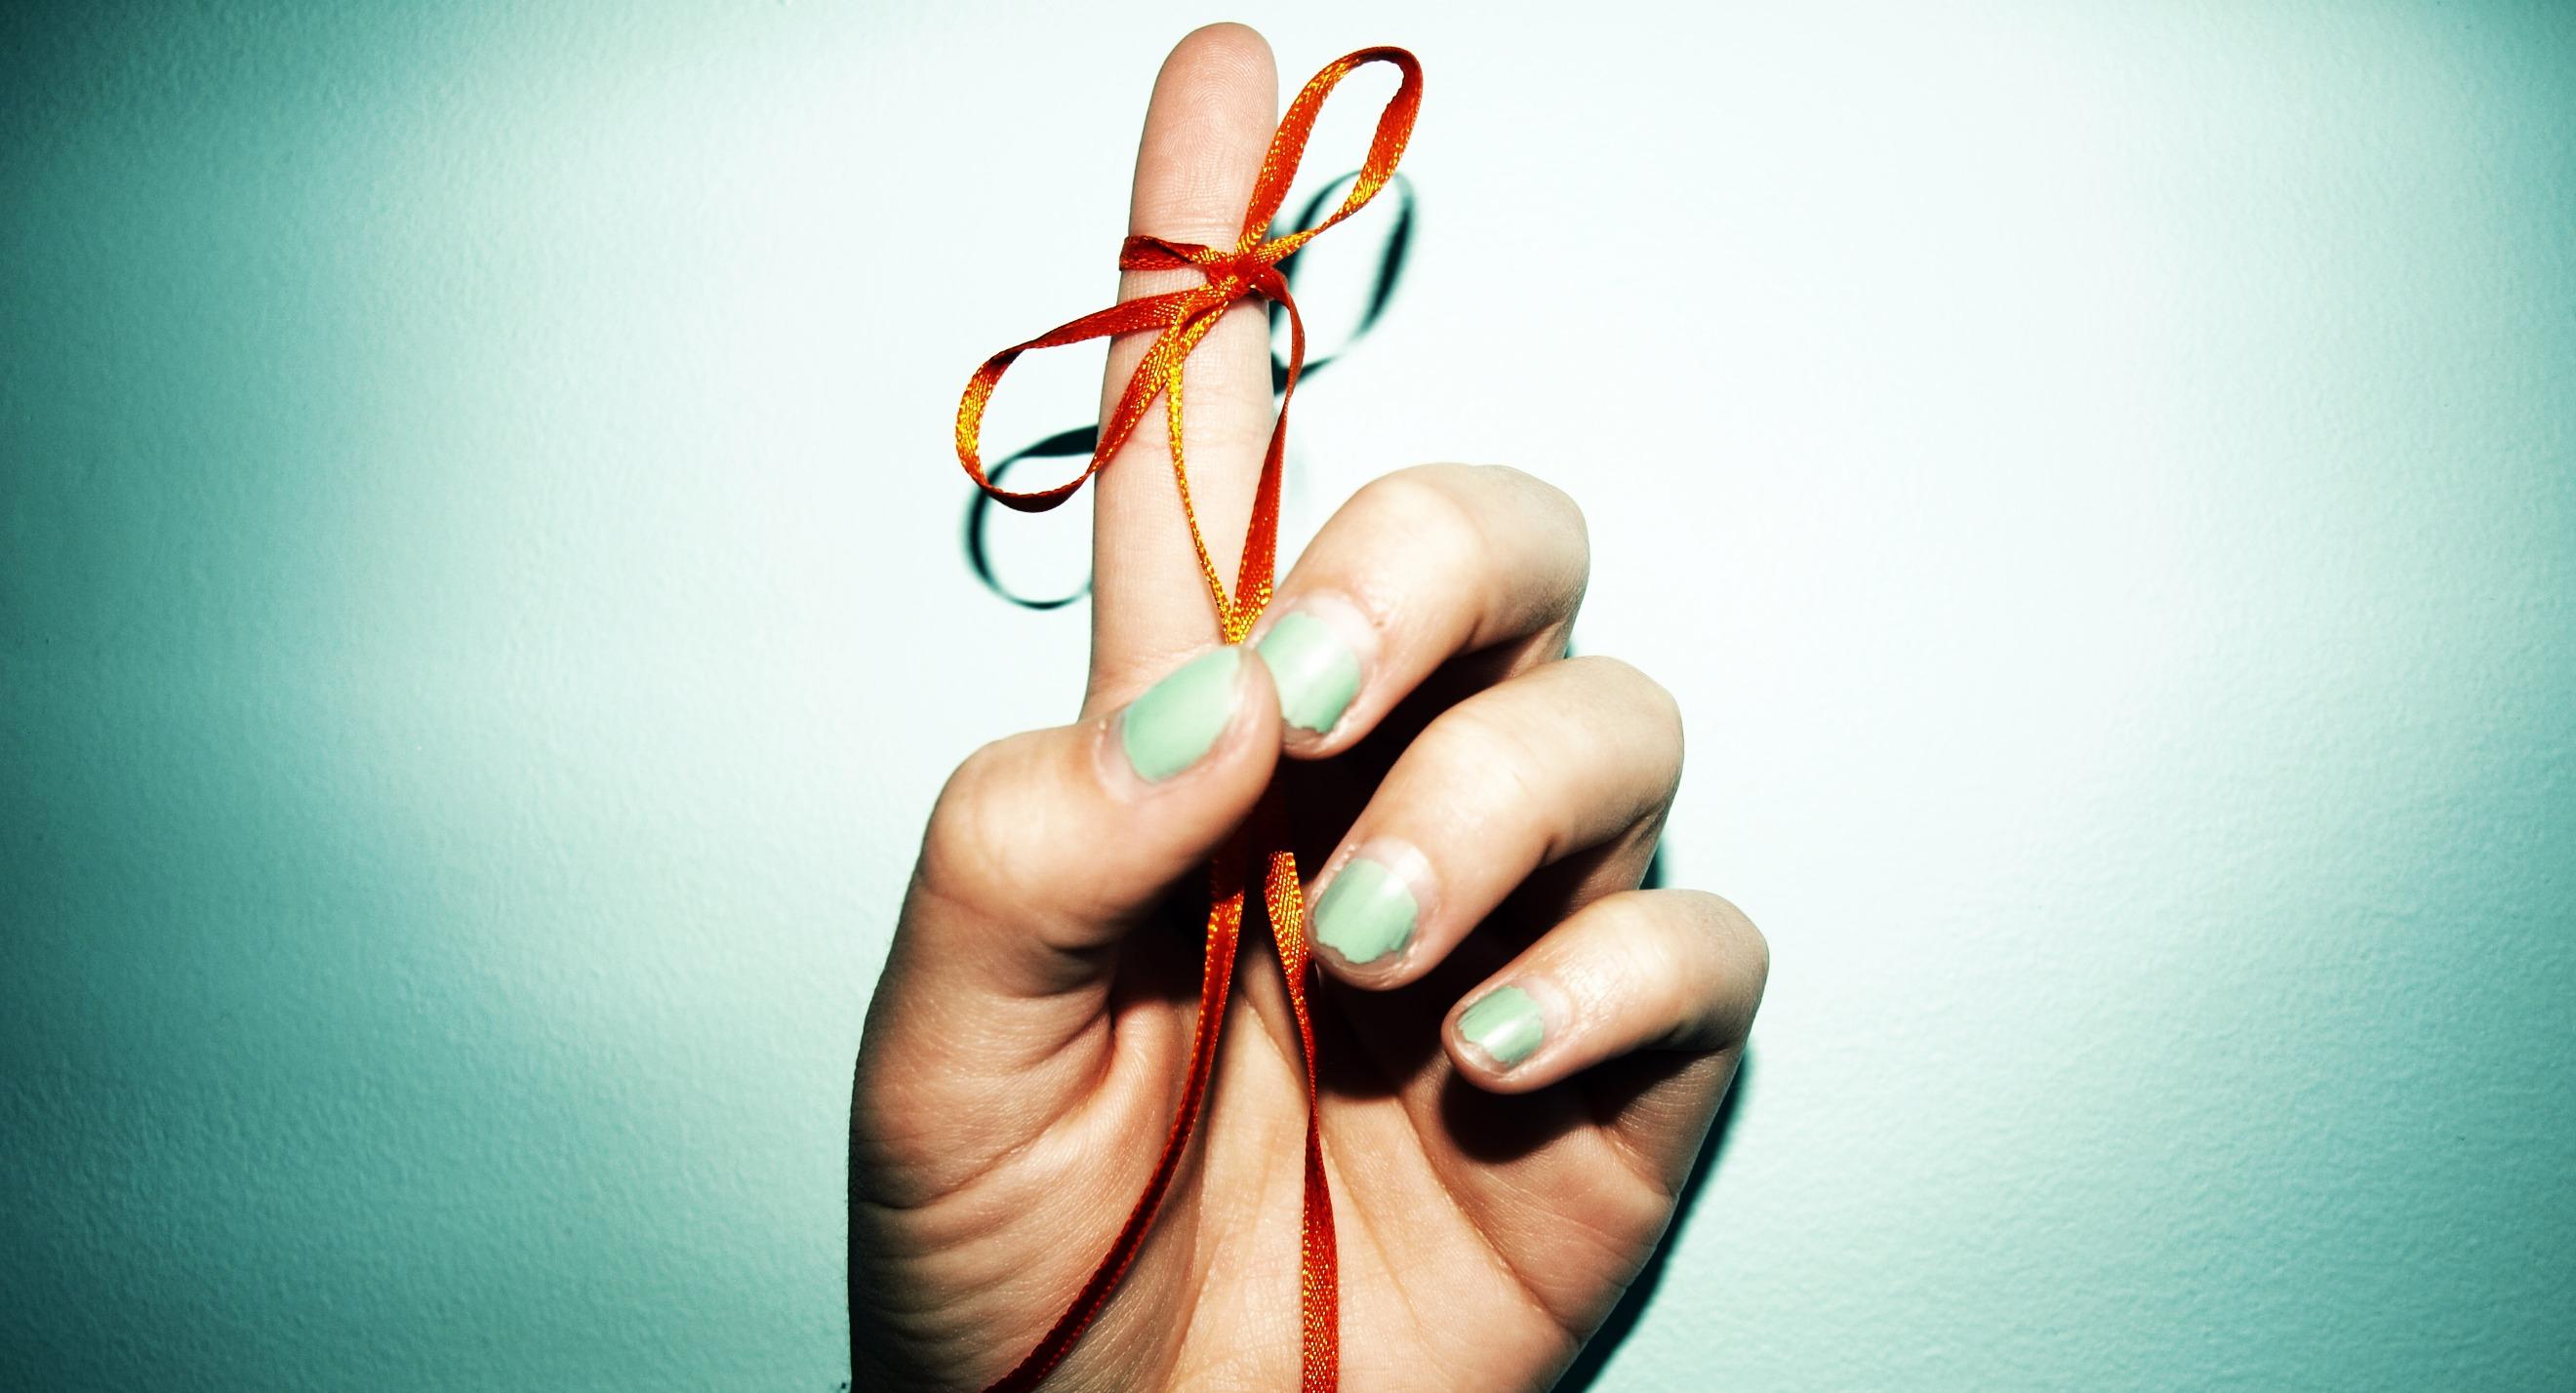 Reminder ribbon tied to finger.